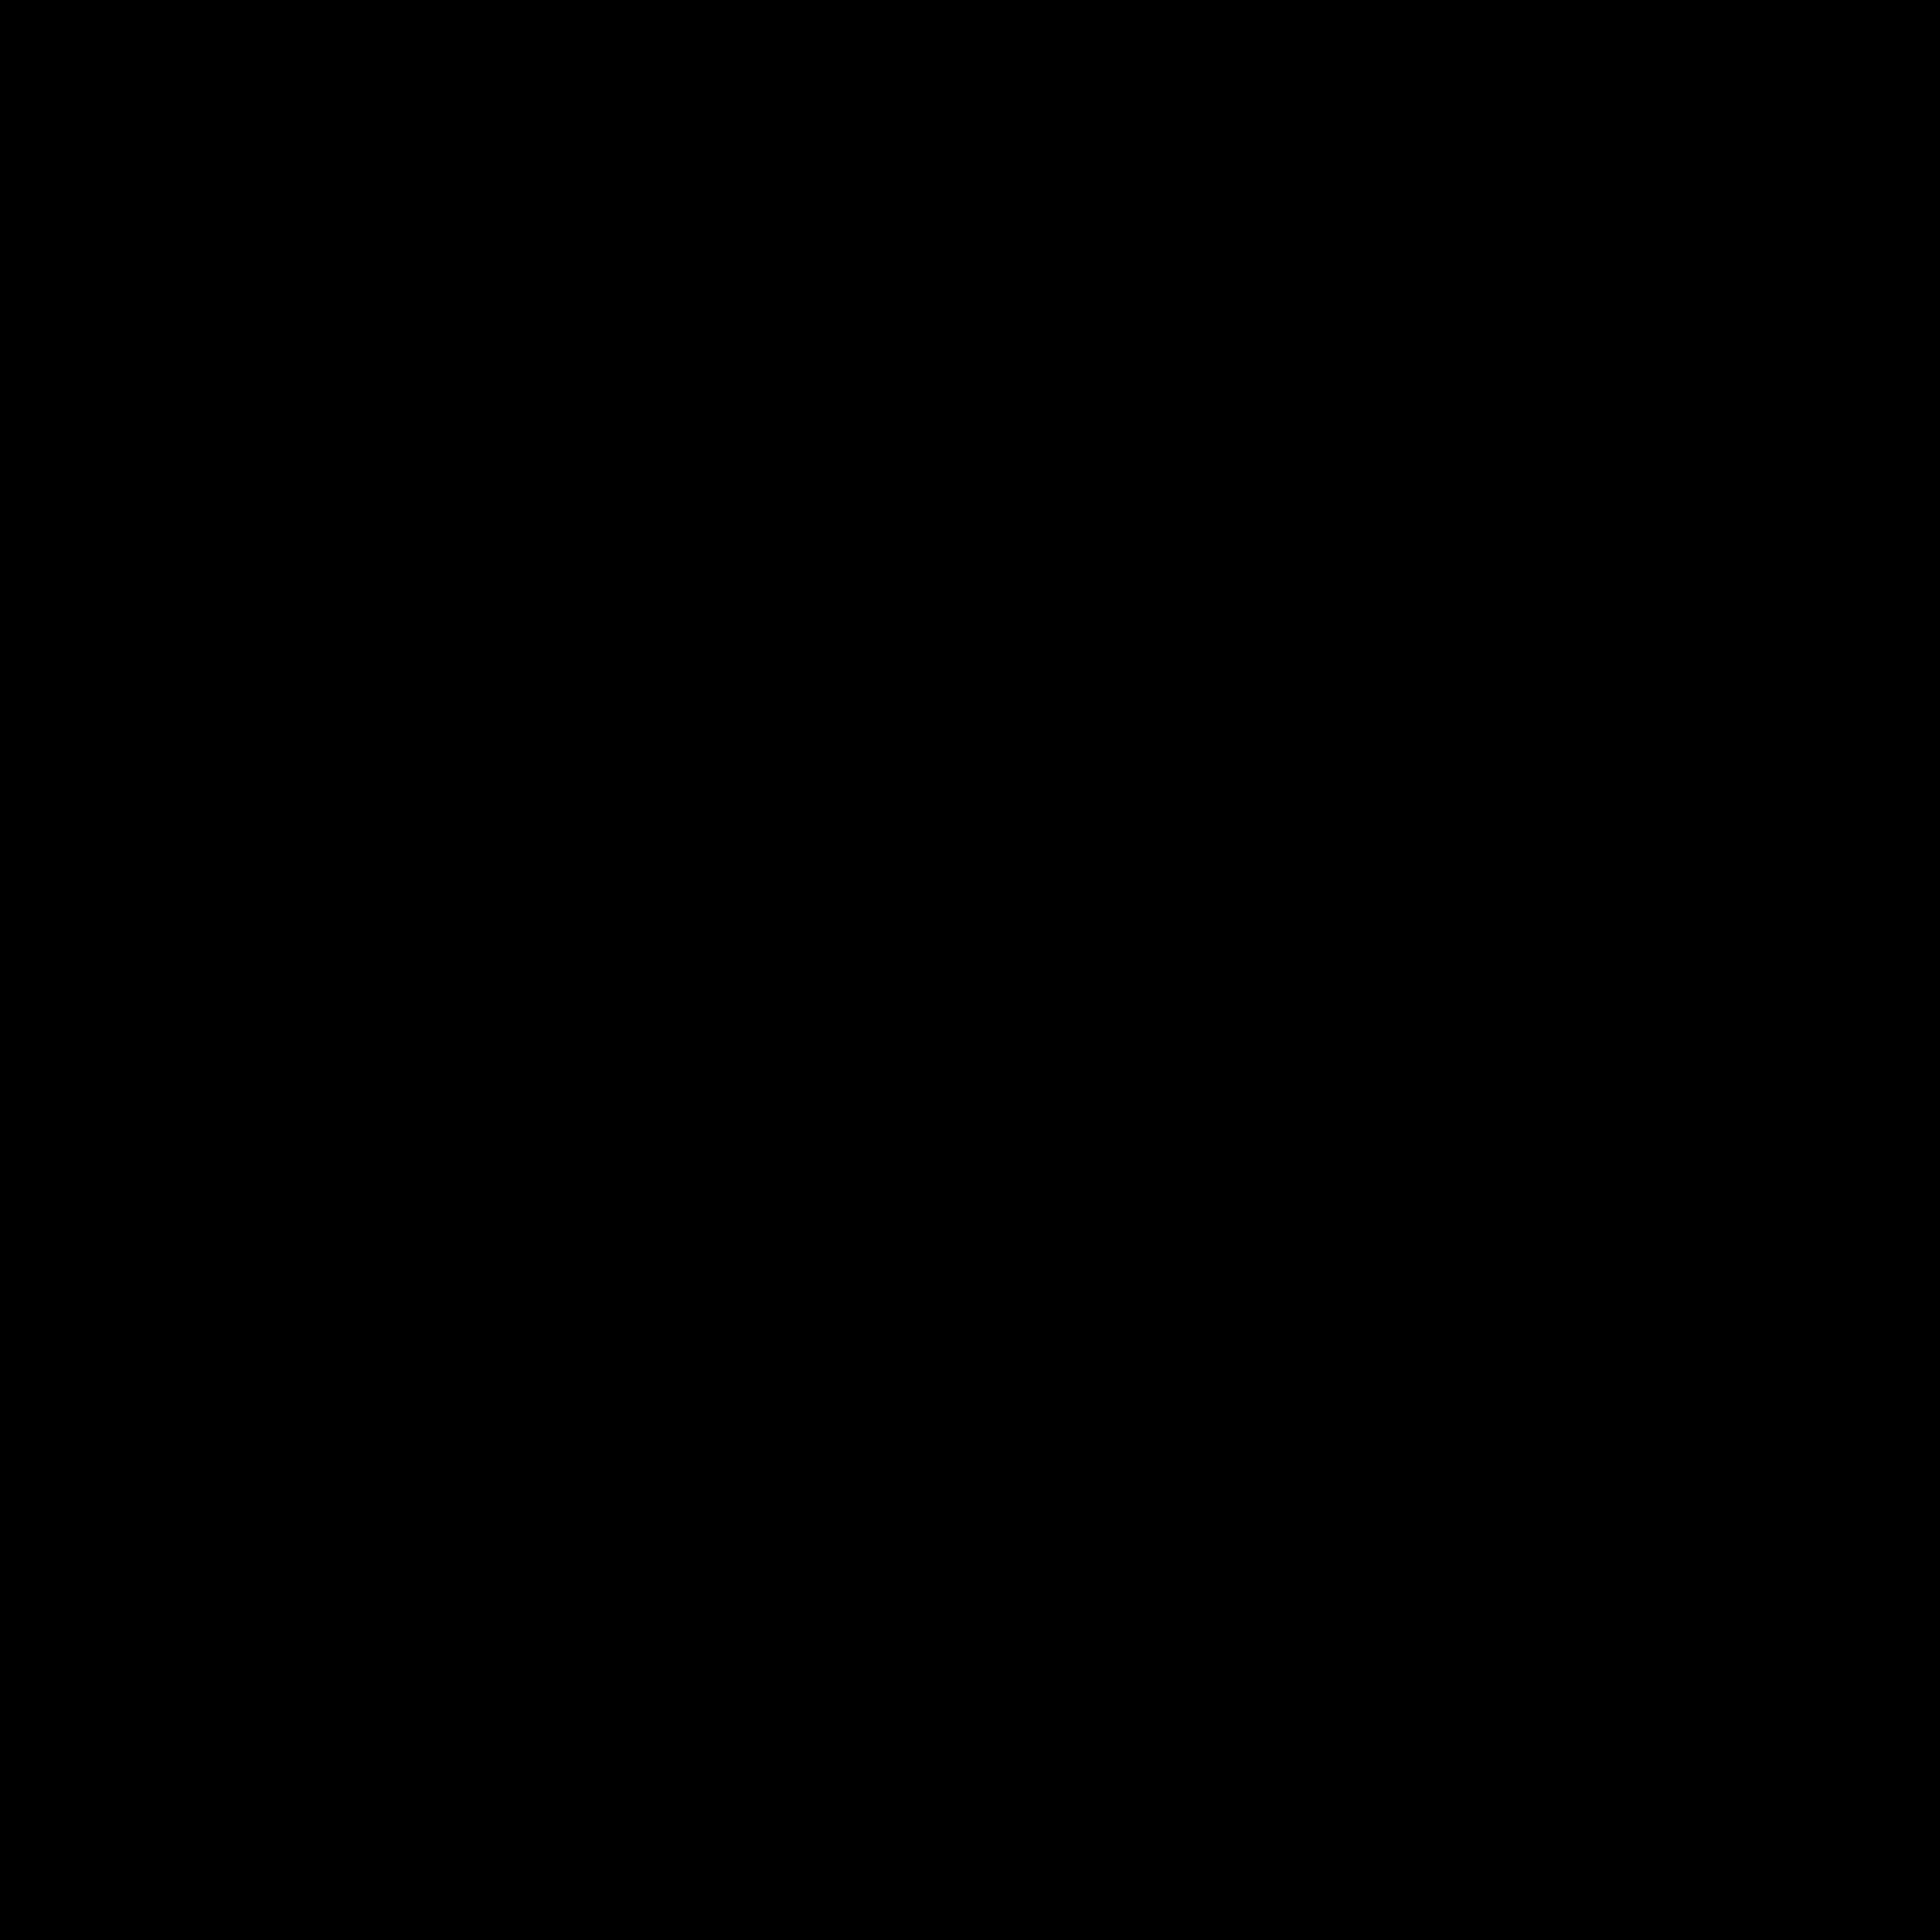 Background họa tiết trống đồng